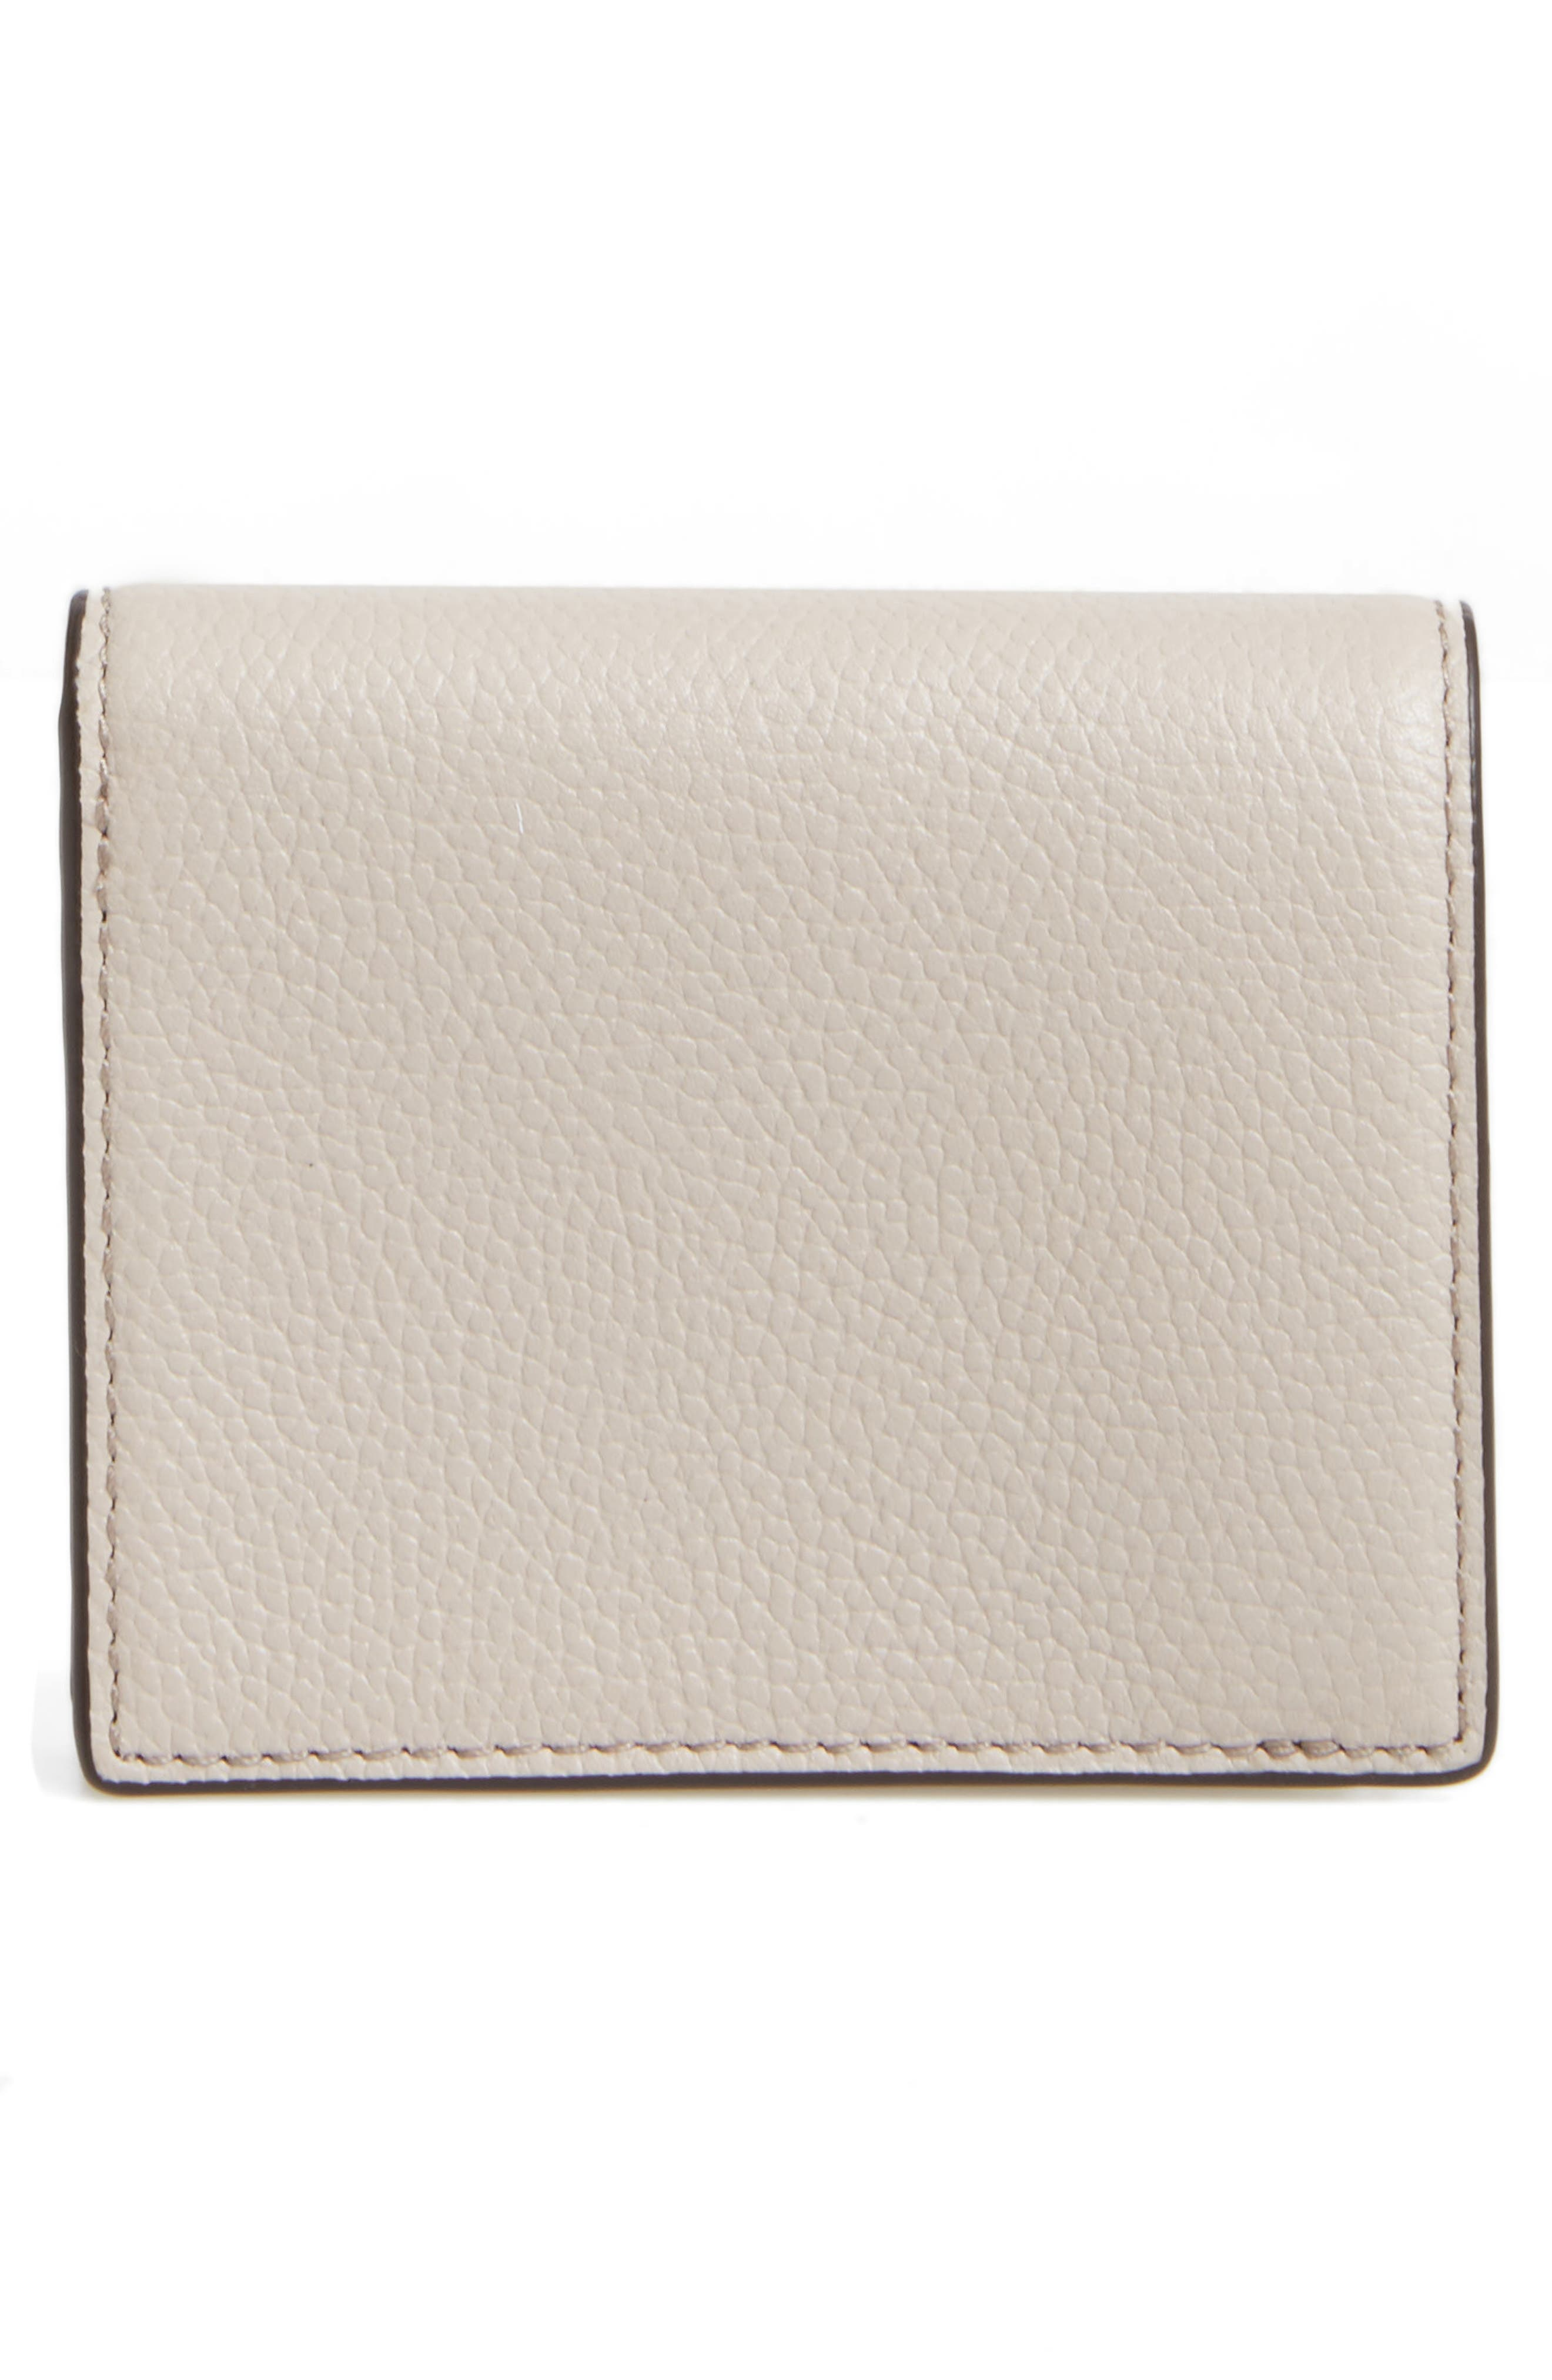 Alternate Image 3  - MICHAEL Michael Kors Mercer Leather RFID Cardholder Wallet